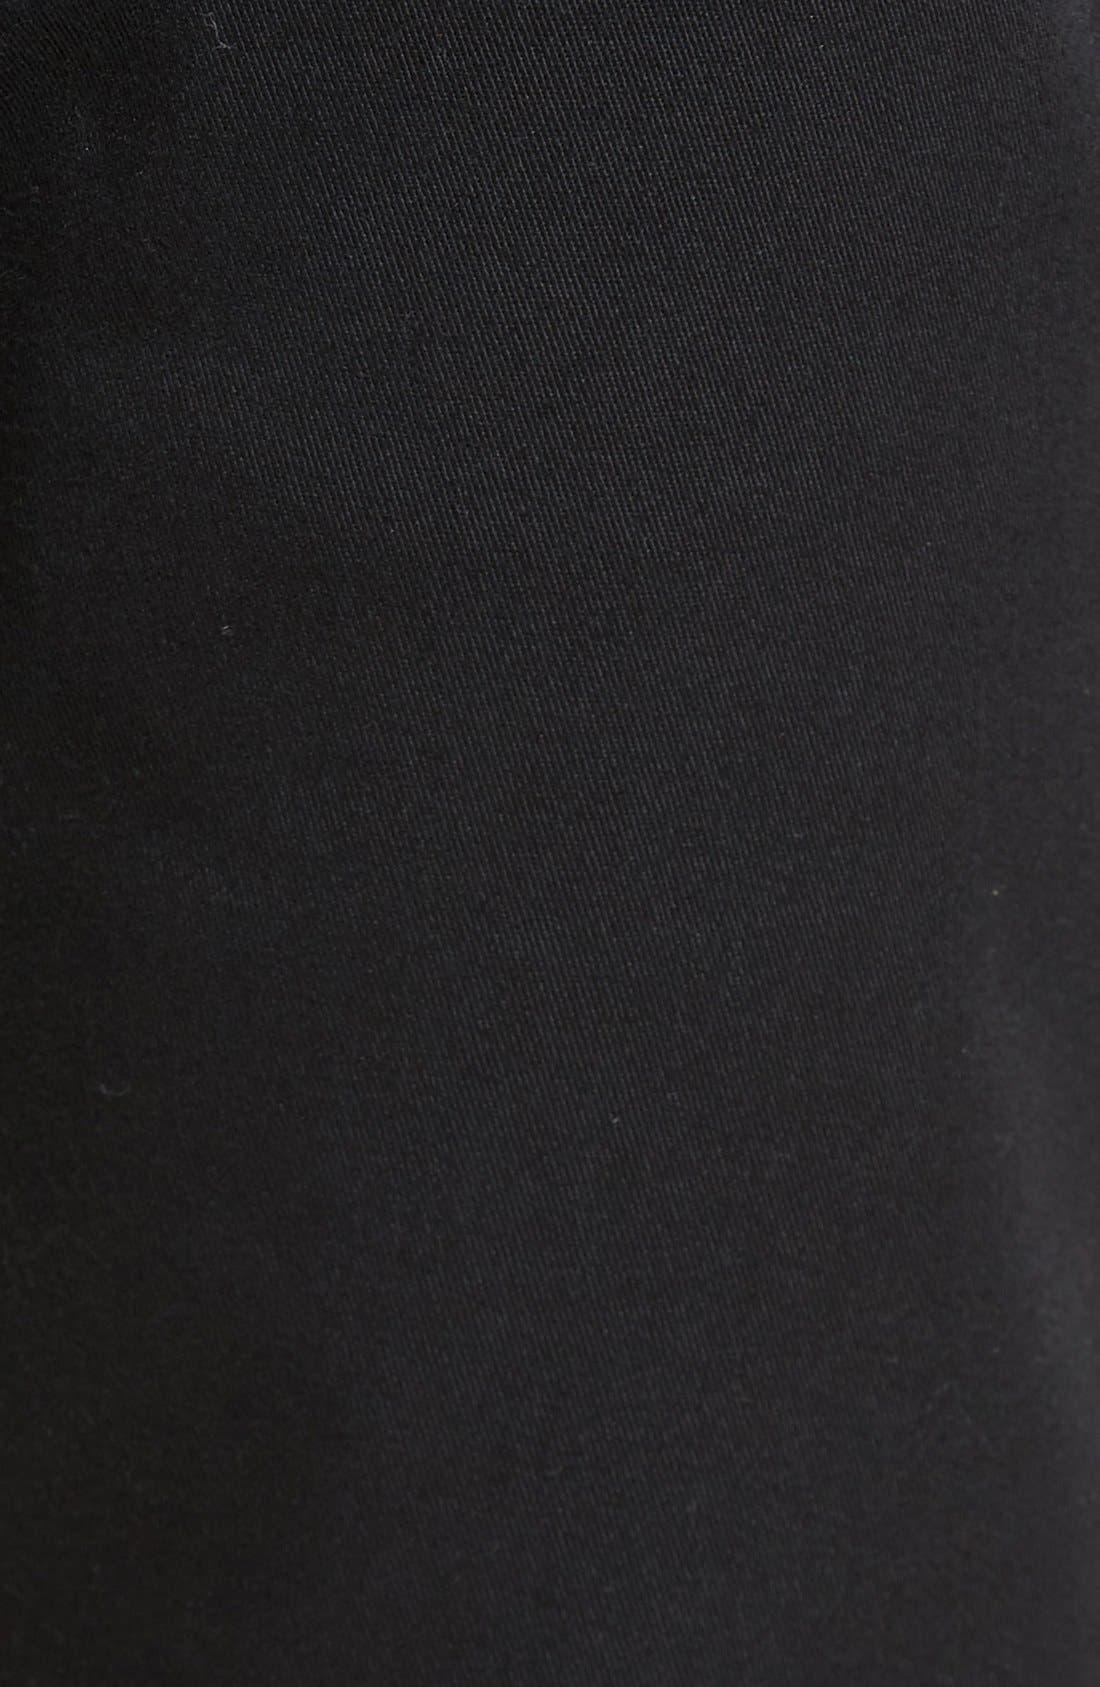 V56 Covina II Slim Fit Pants,                             Alternate thumbnail 28, color,